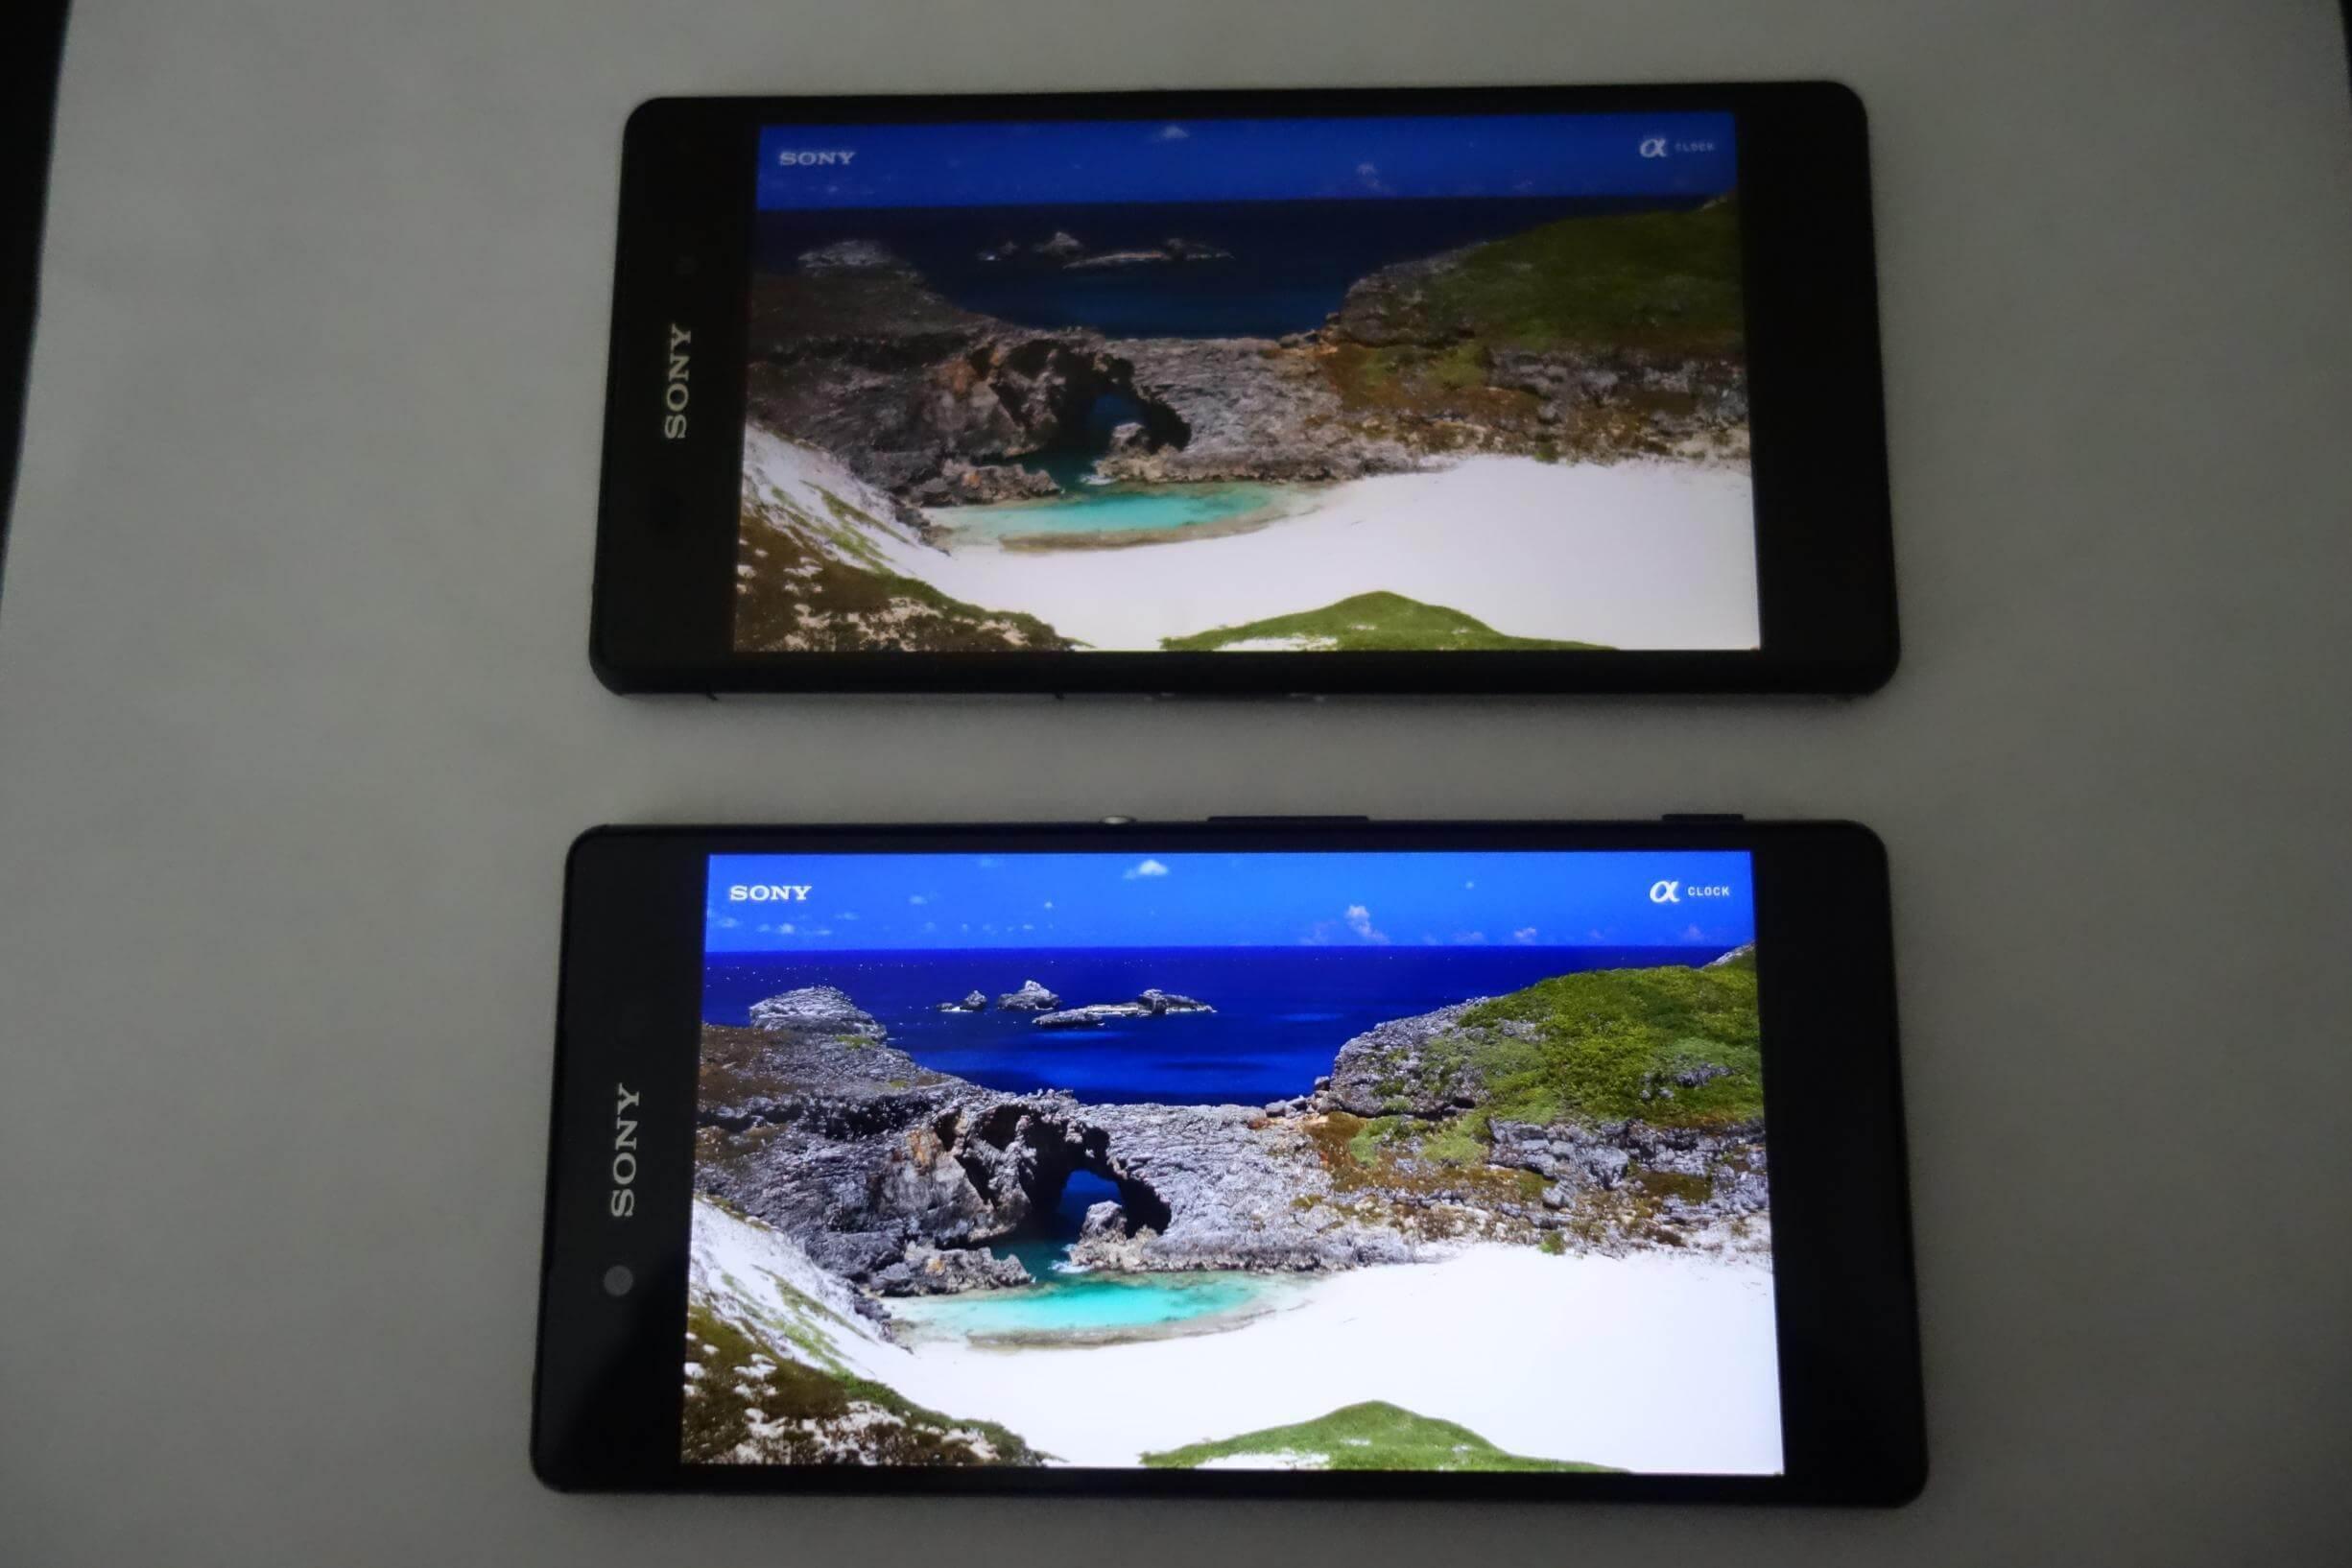 Xperia Z2 vs Xperia Z3+ Display